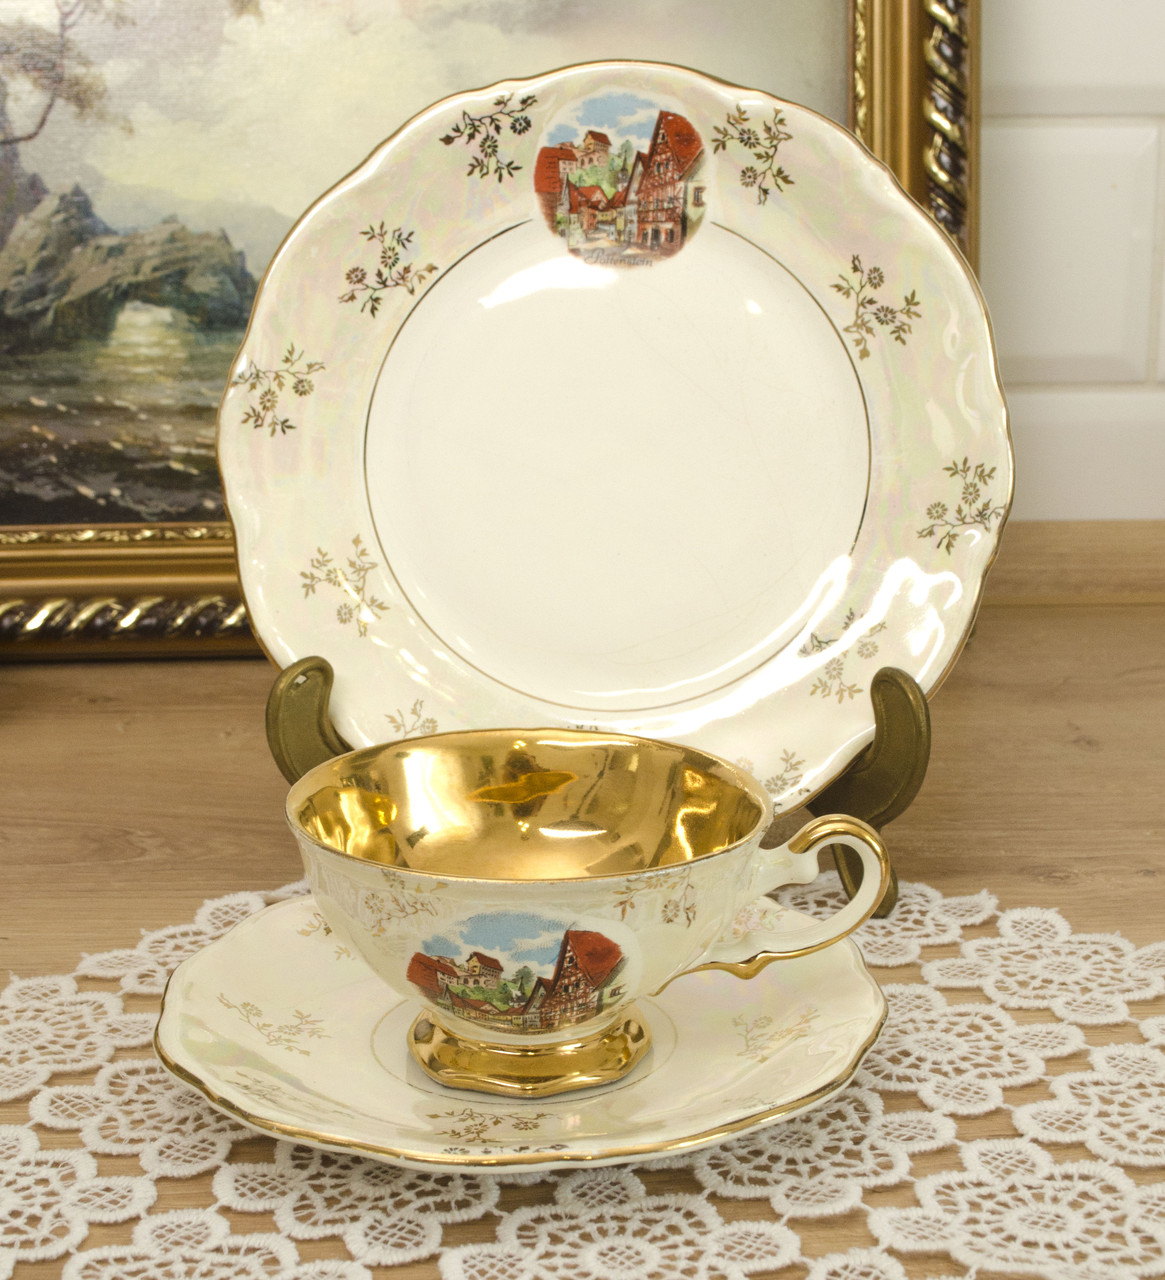 Винтажная чайная тройка, чашка, блюдце, тарелка, KHM, Германия, фарфор